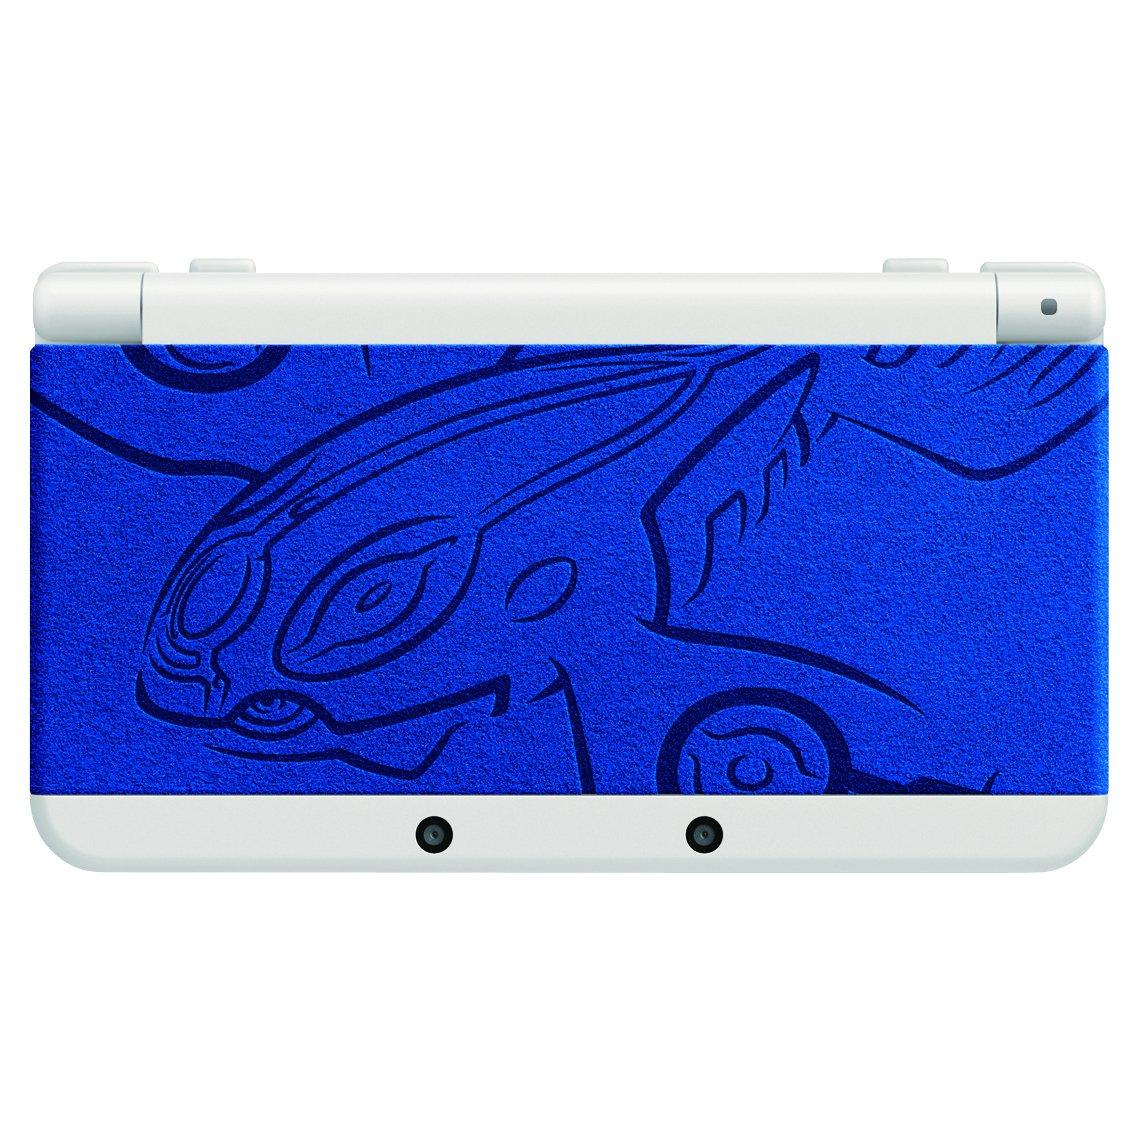 Pokemon Center Original New Nintendo 3DS Kyogre Edition